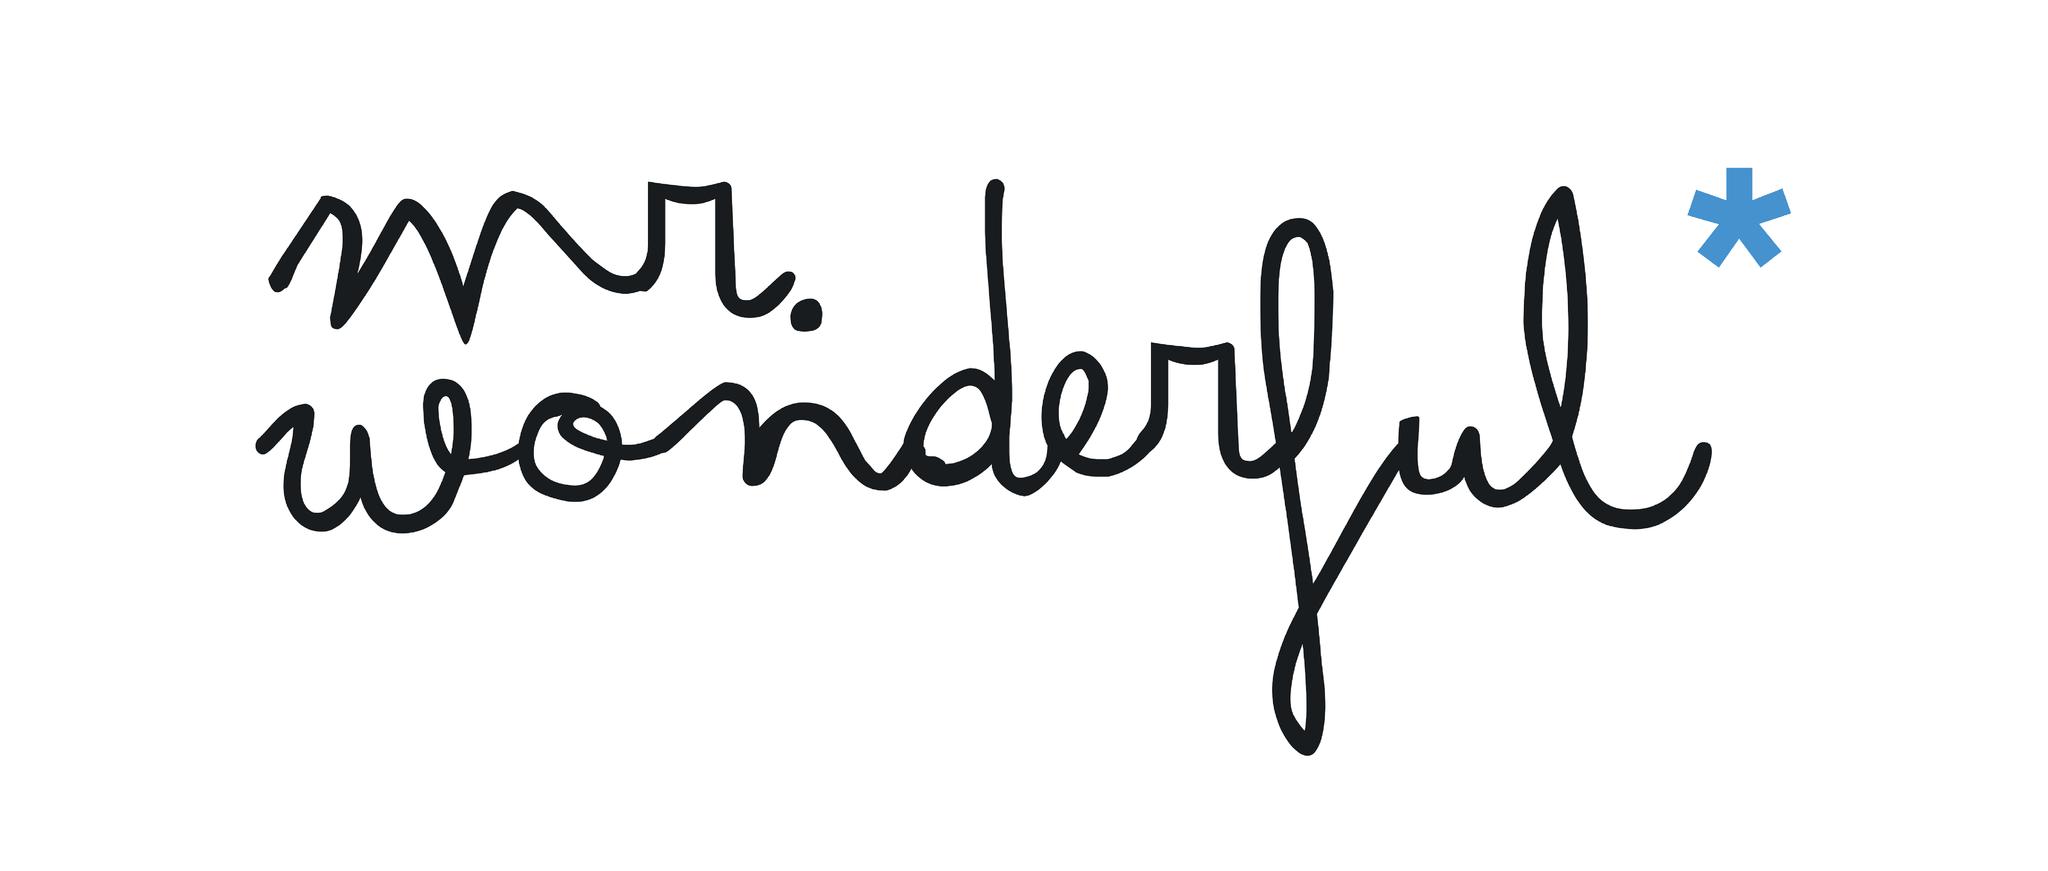 Mr Wonderful